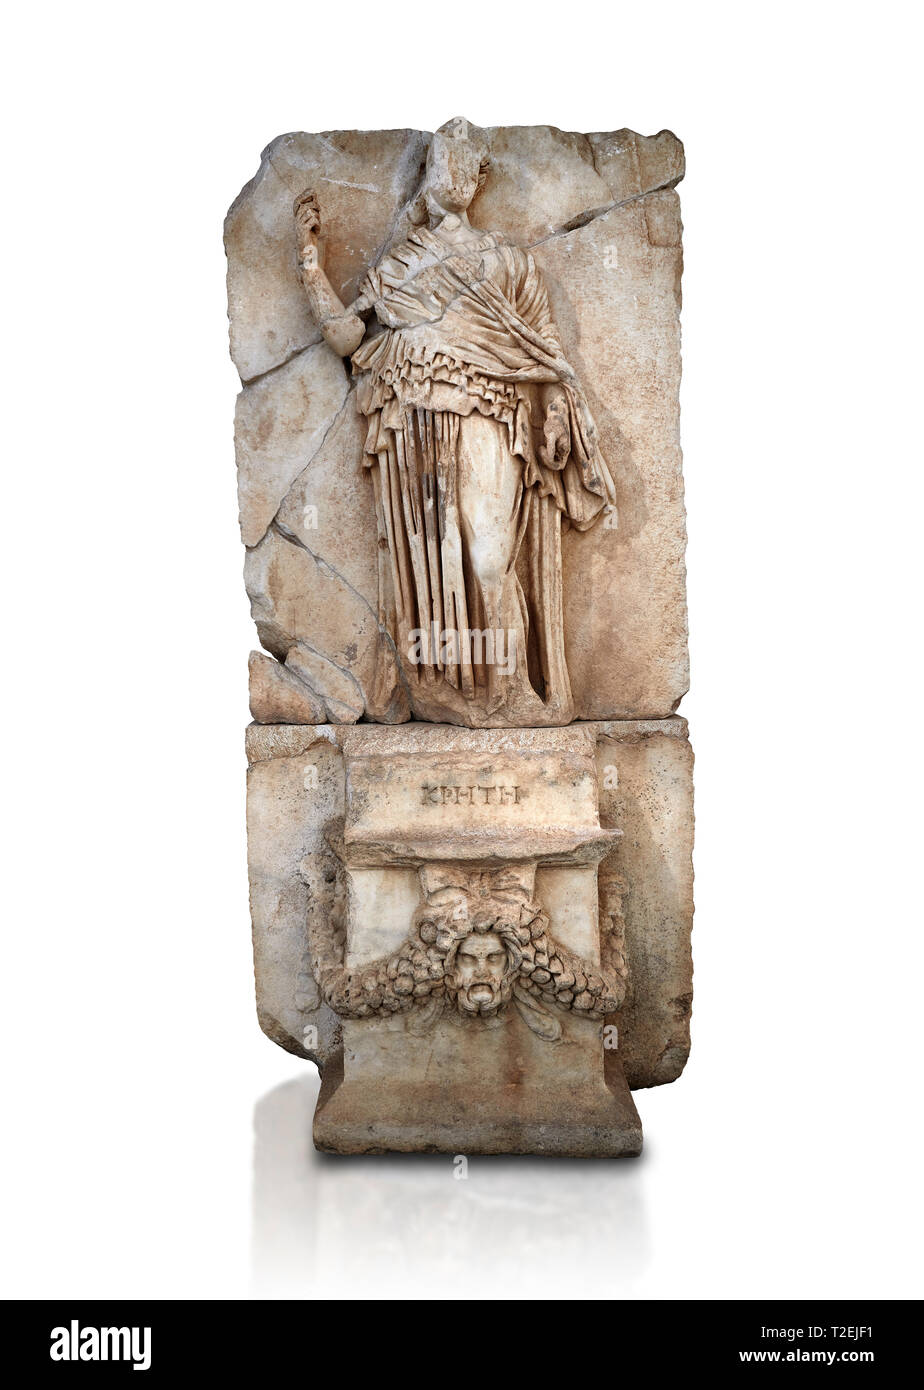 Roman Sebasteion relief sculpture of Krete Aphrodisias Museum, Aphrodisias, Turkey.   Against a white background.  The classical hairstyle, dress and  Stock Photo